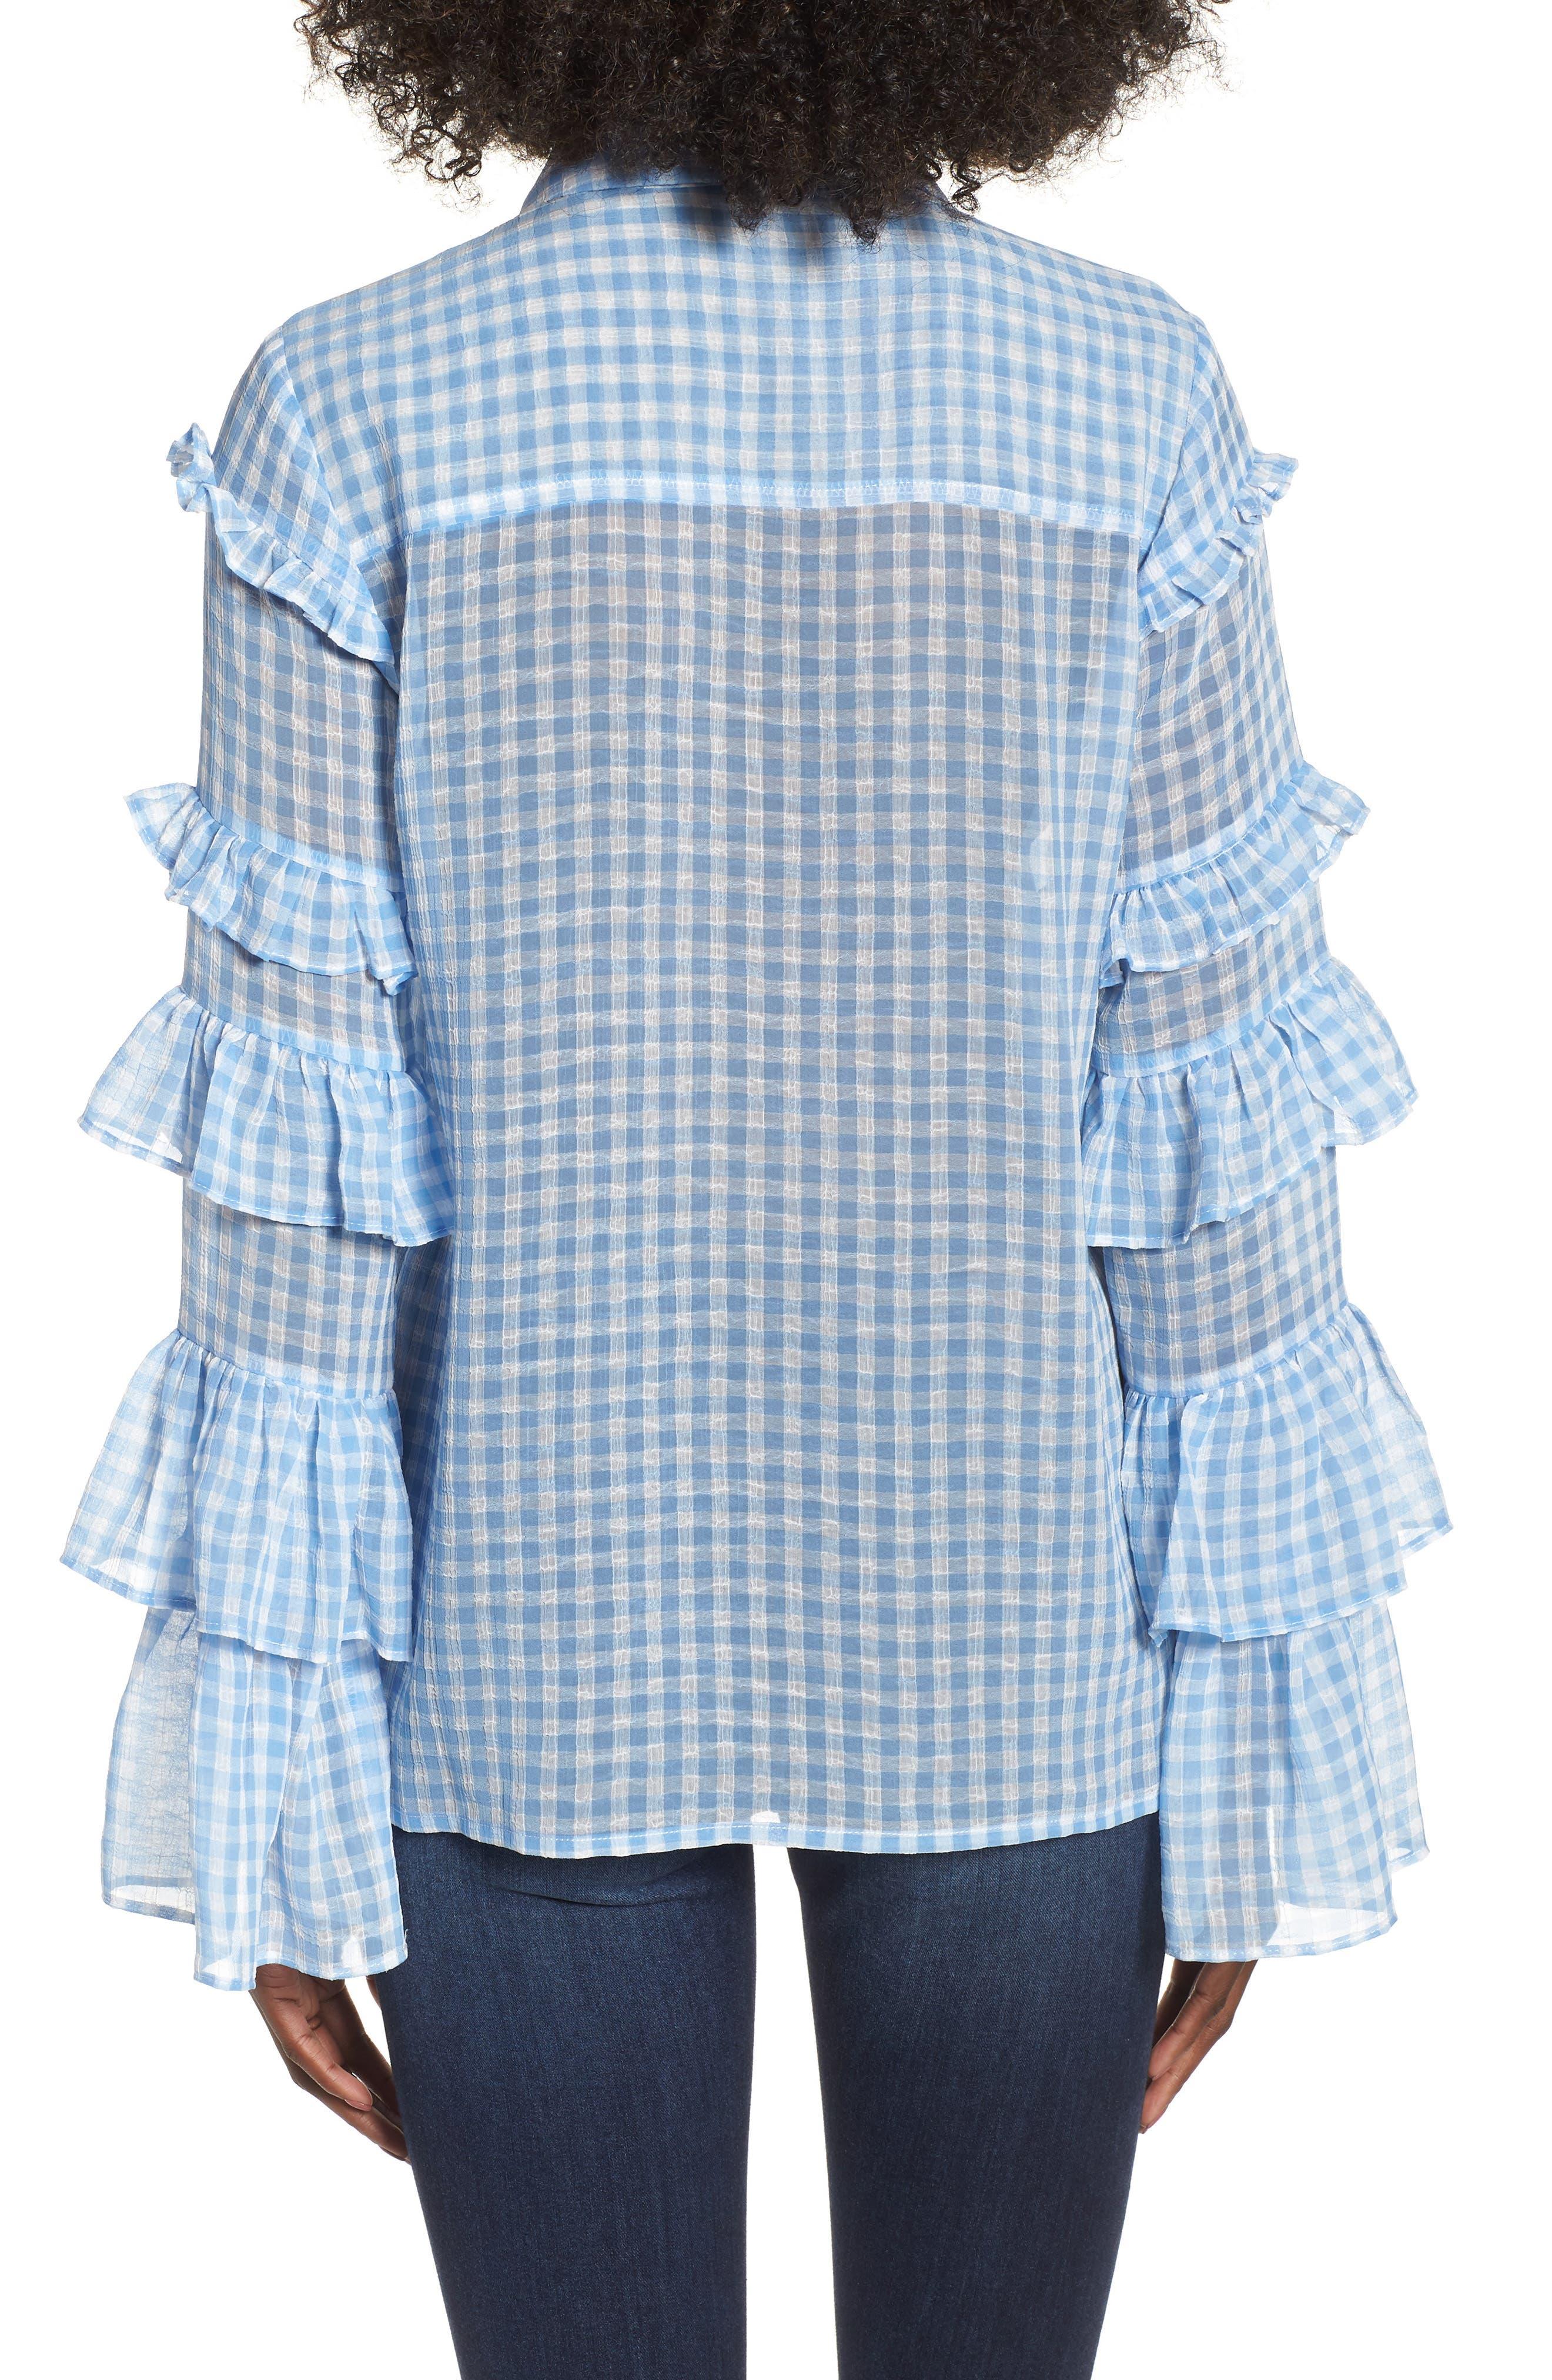 Ruffle Sleeve Shirt,                             Alternate thumbnail 2, color,                             400